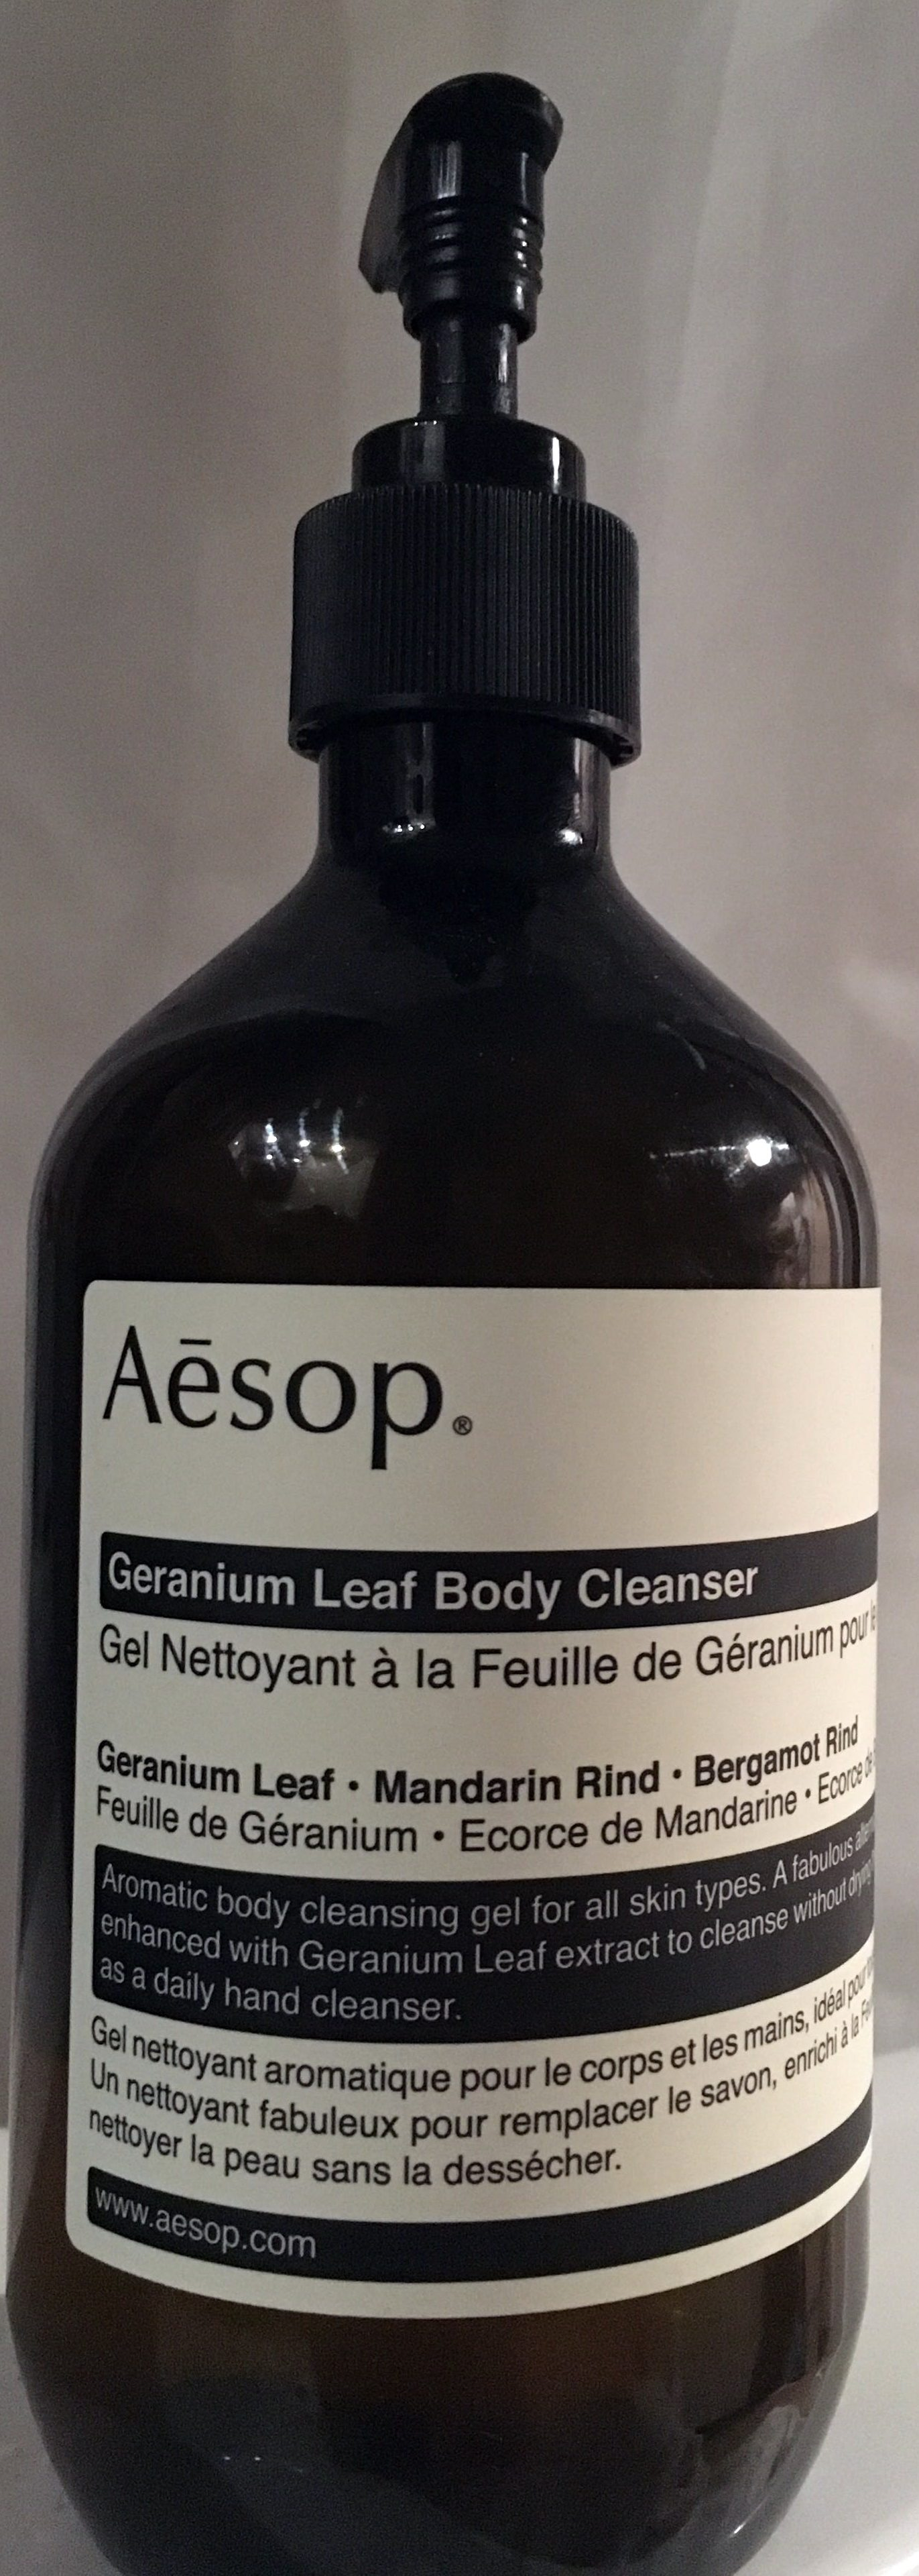 Geranium leaf body cleanser - Produit - fr